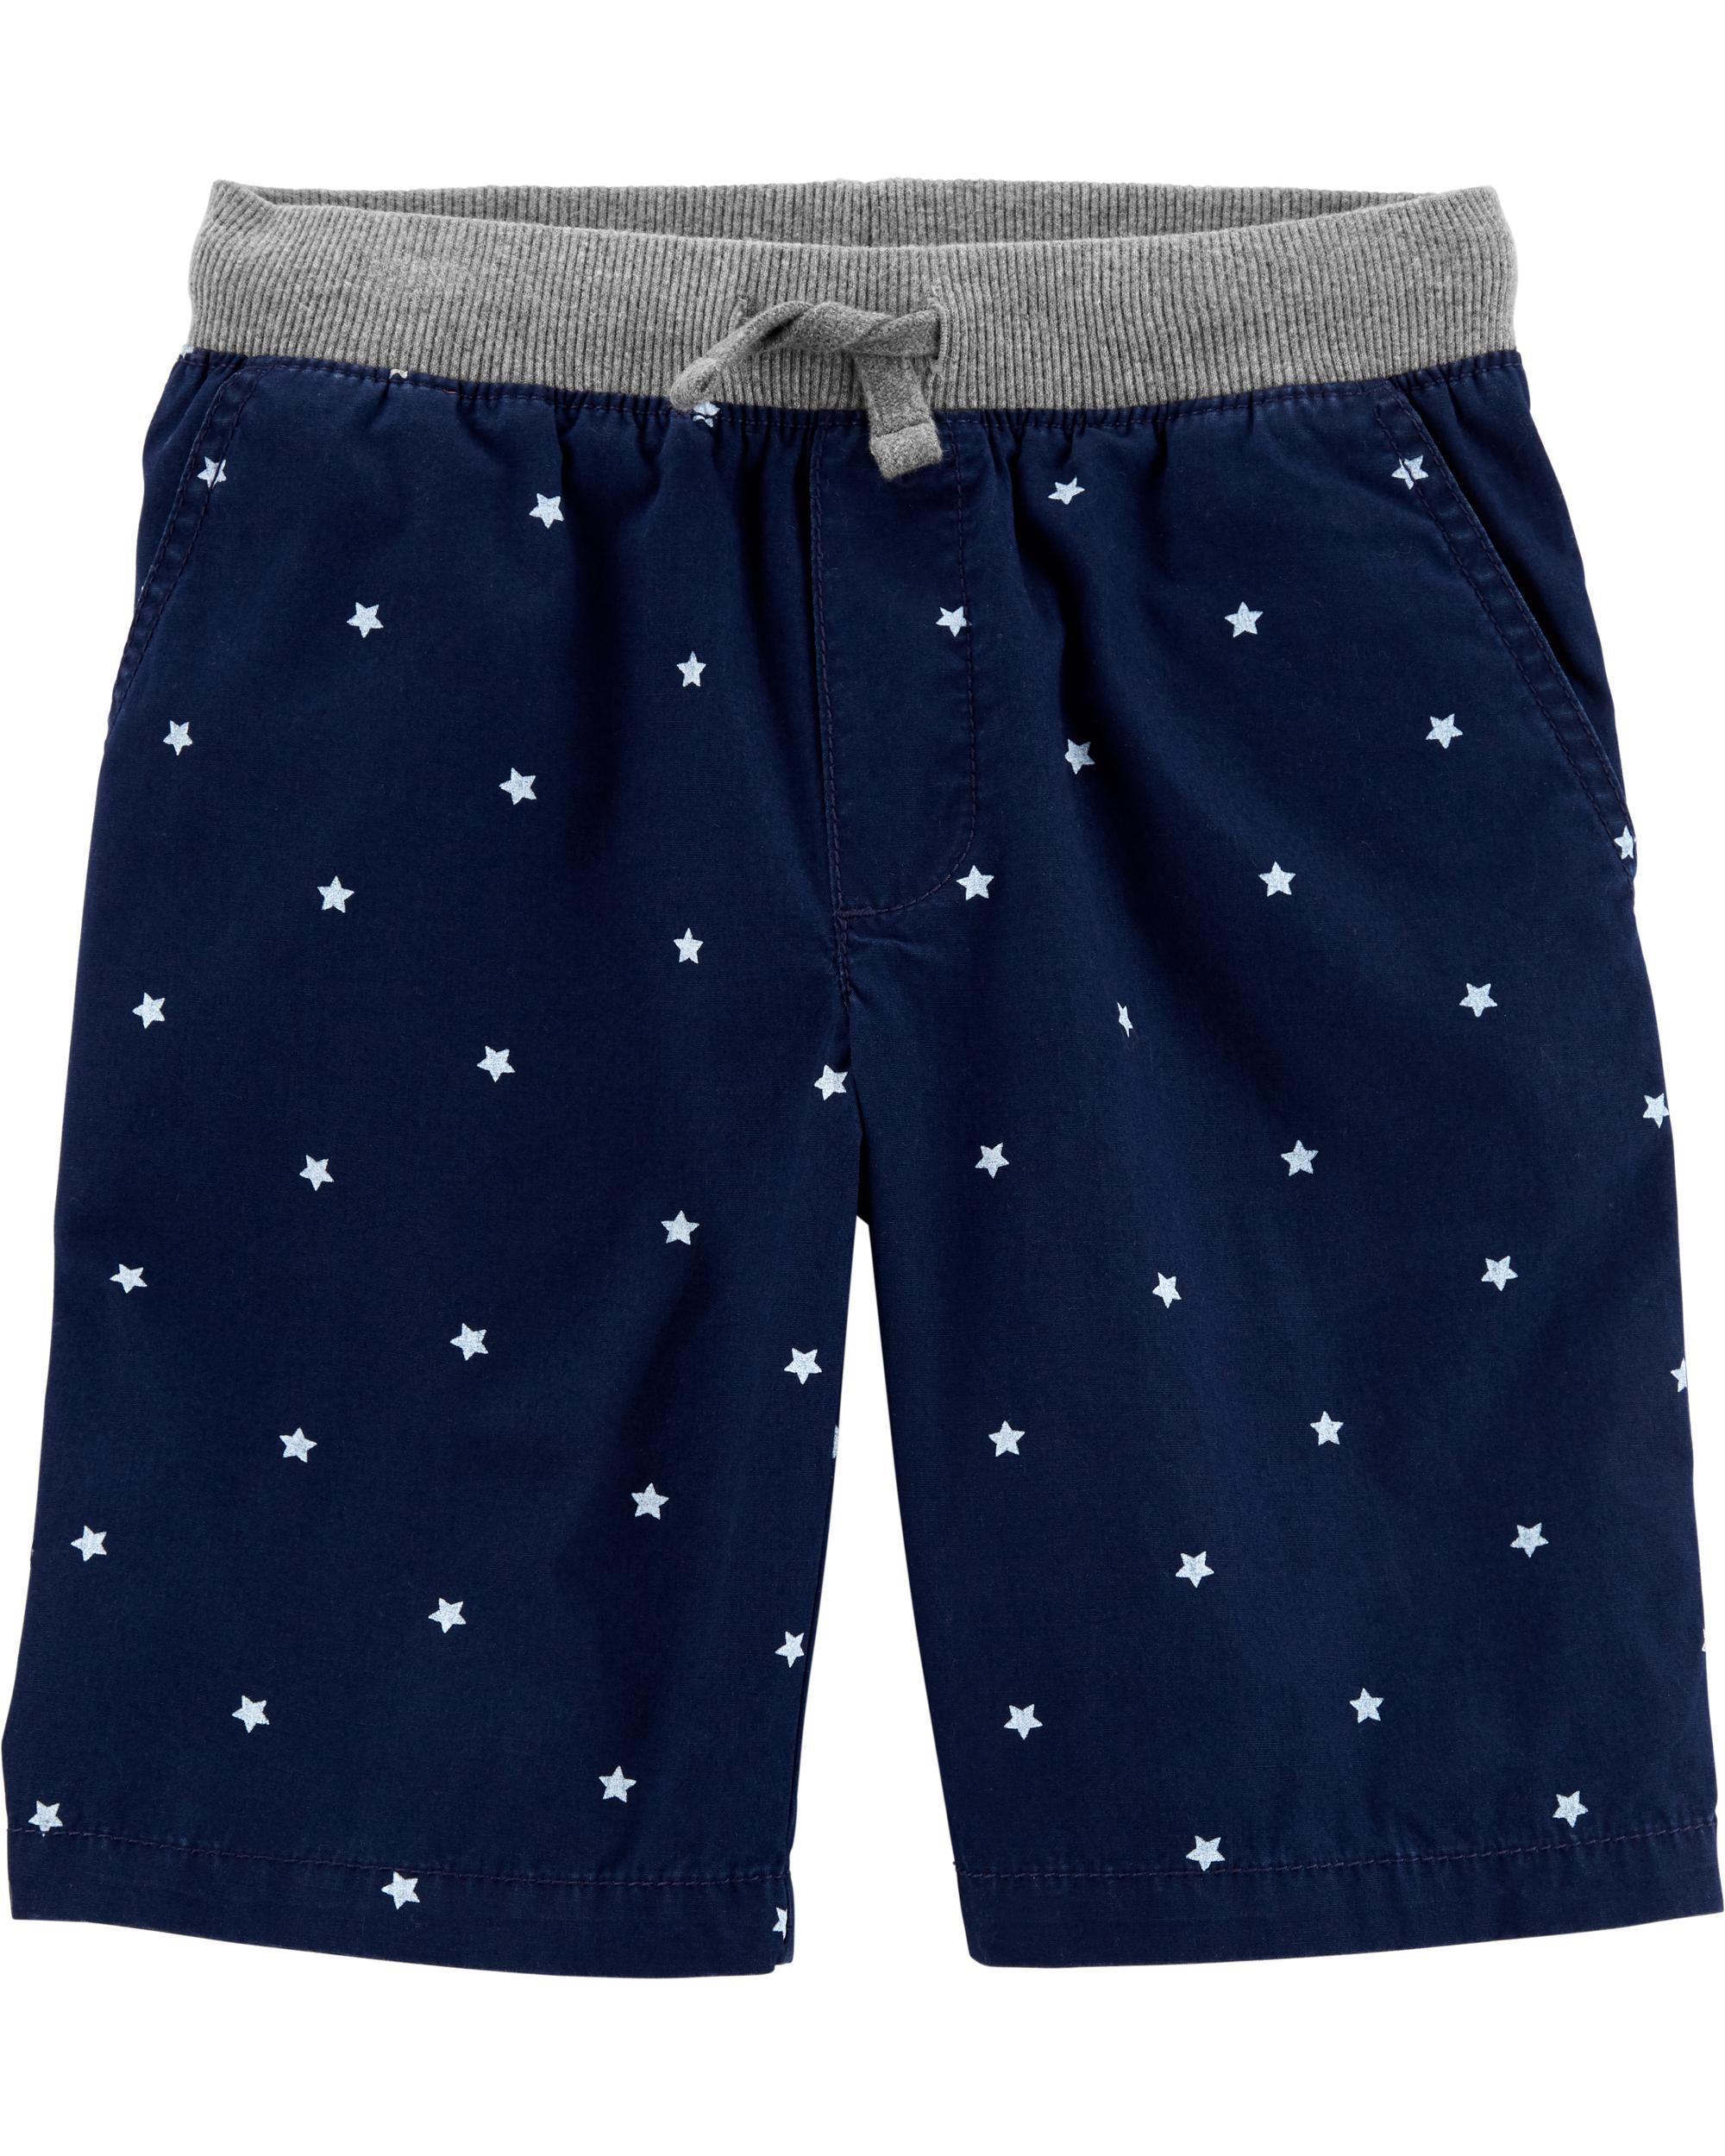 *Clearance*  Star Pull-On Poplin Shorts